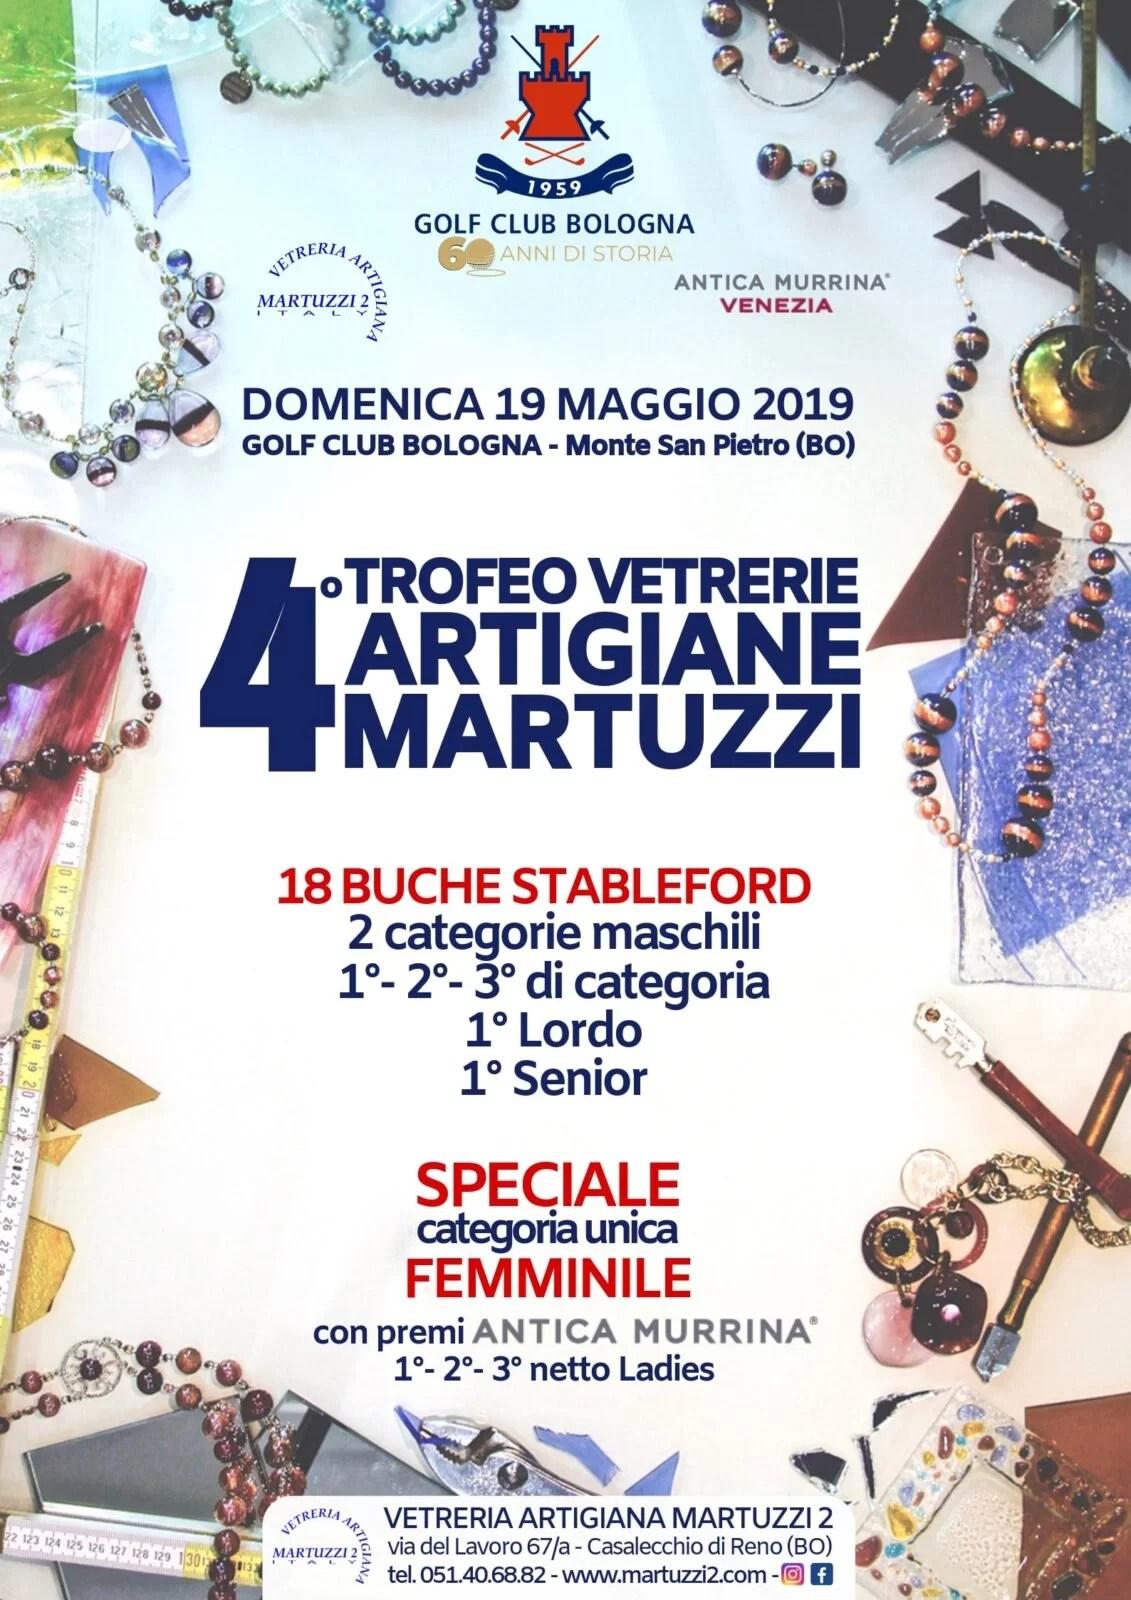 4° Trofeo Vetrerie Artigiane Martuzzi